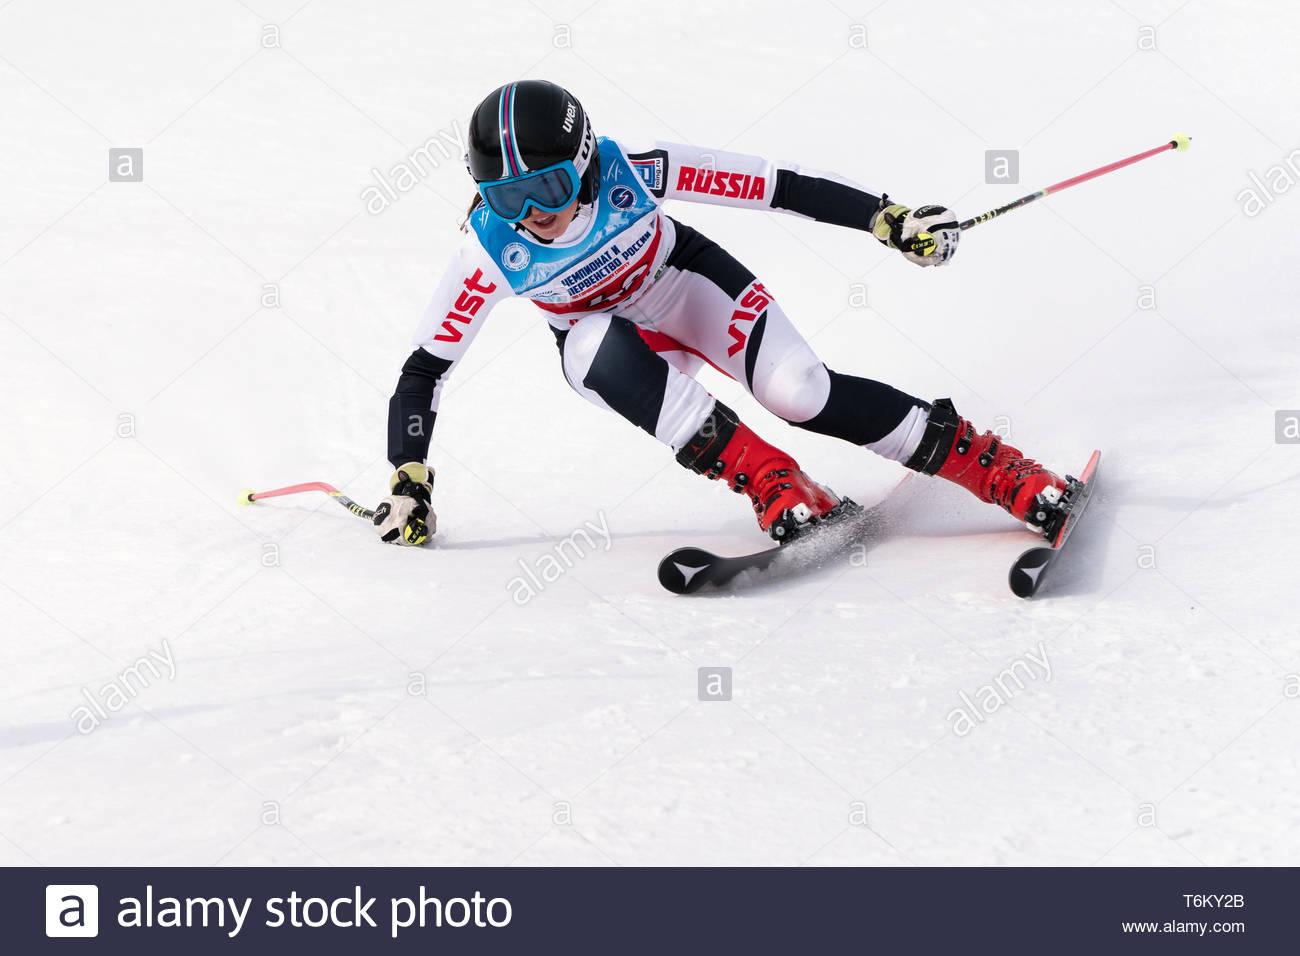 KAMCHATKA PENINSULA, RUSSIA - APR 2, 2019: Mountain skier Ellina Dyachenko (Sakhalin) skiing down mount. International Ski Federation Championship, Ru - Stock Image